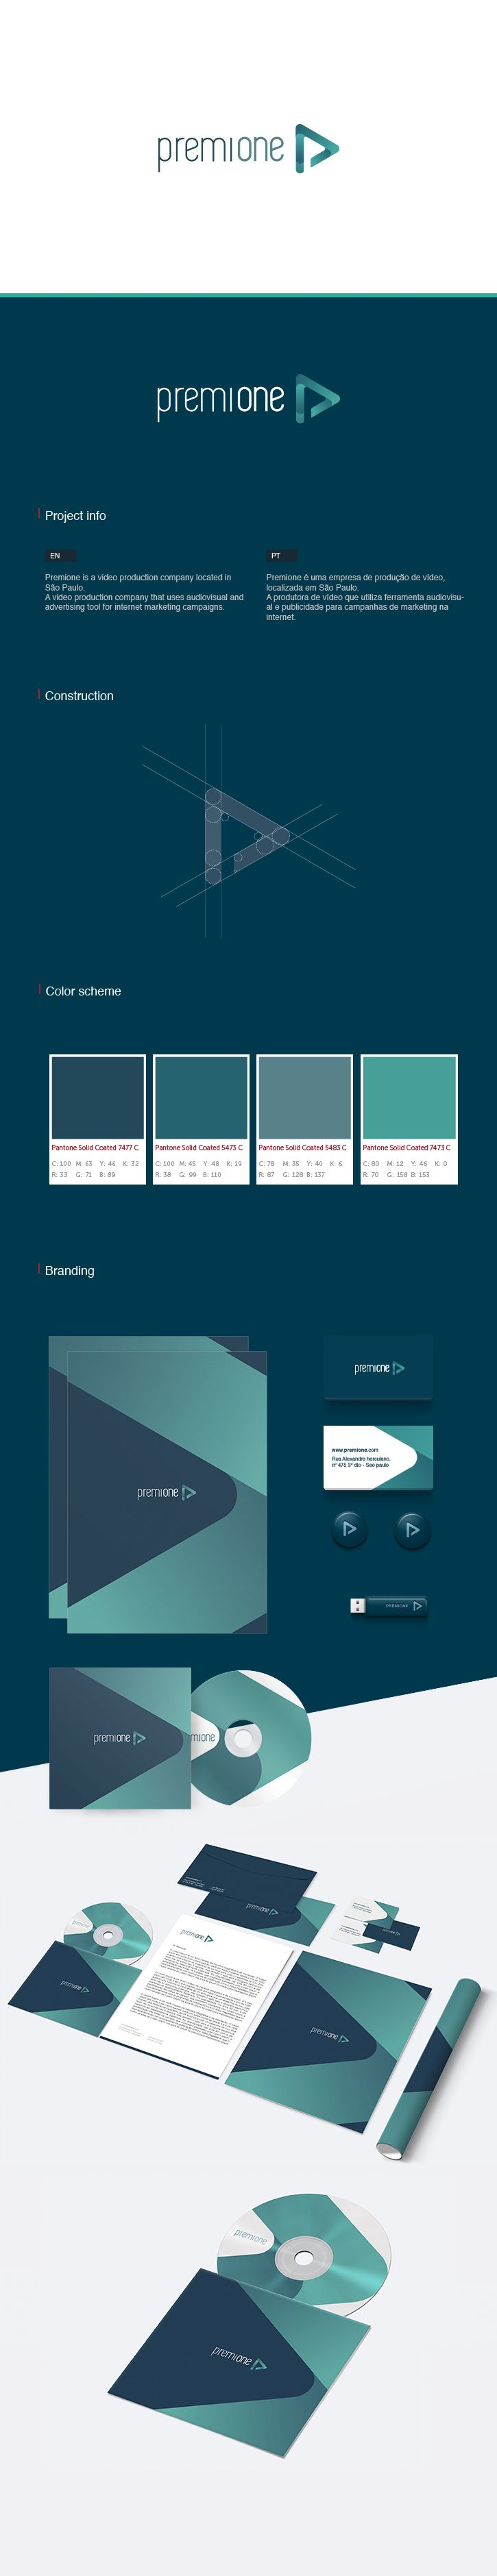 168 best Corporate Design & Branding images on Pinterest